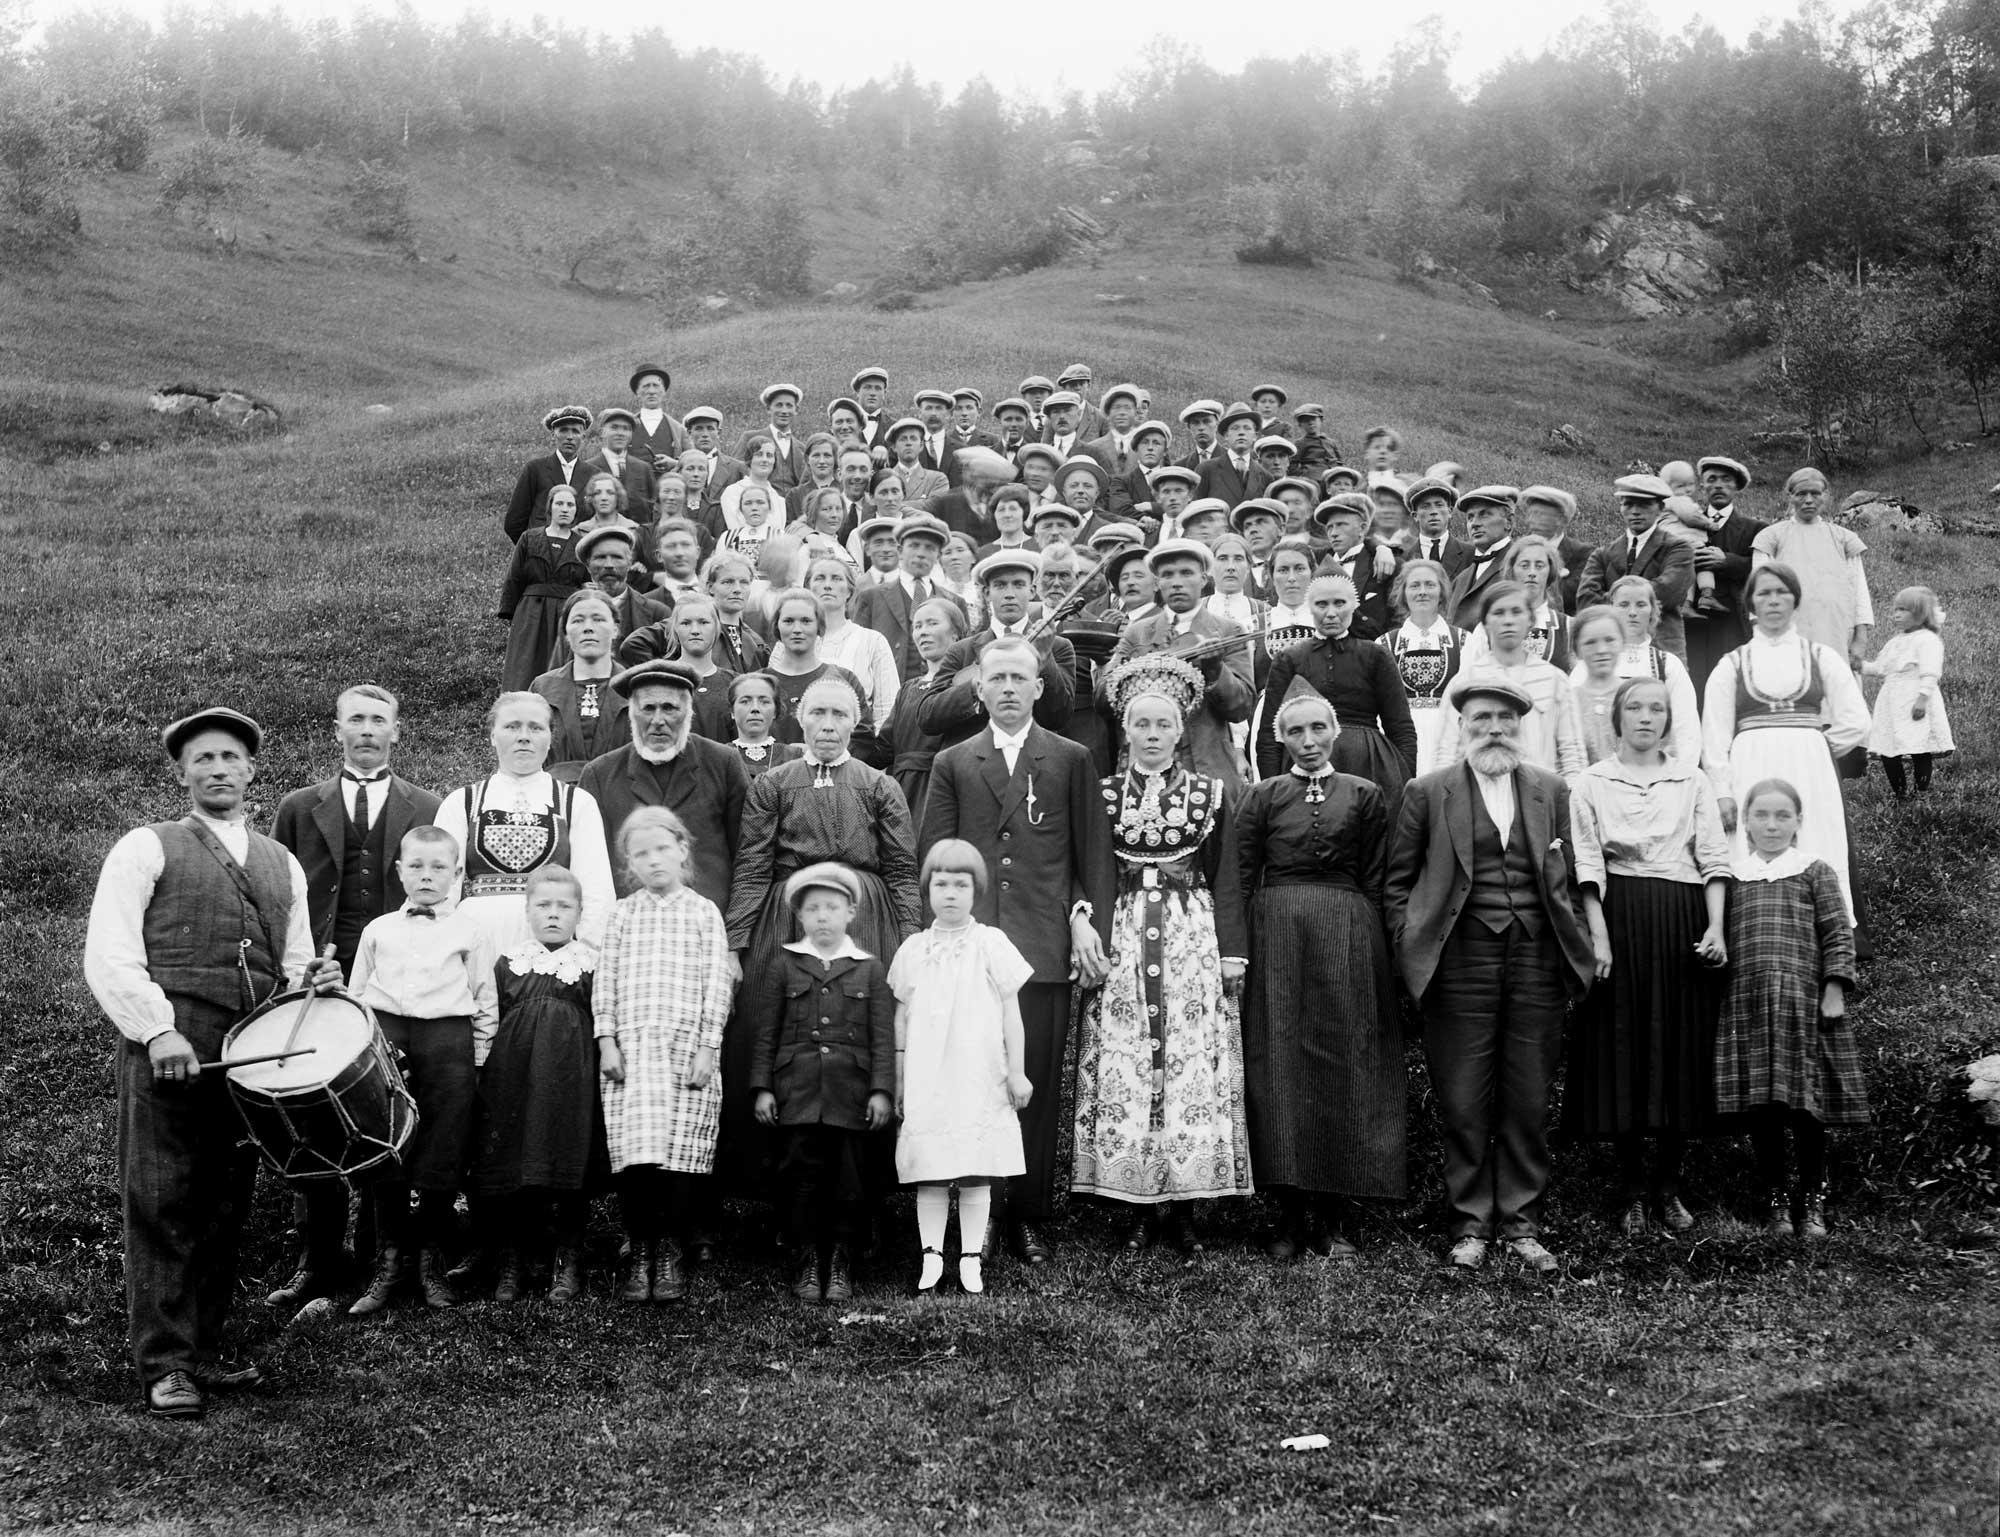 C. 1912-1920 Wedding